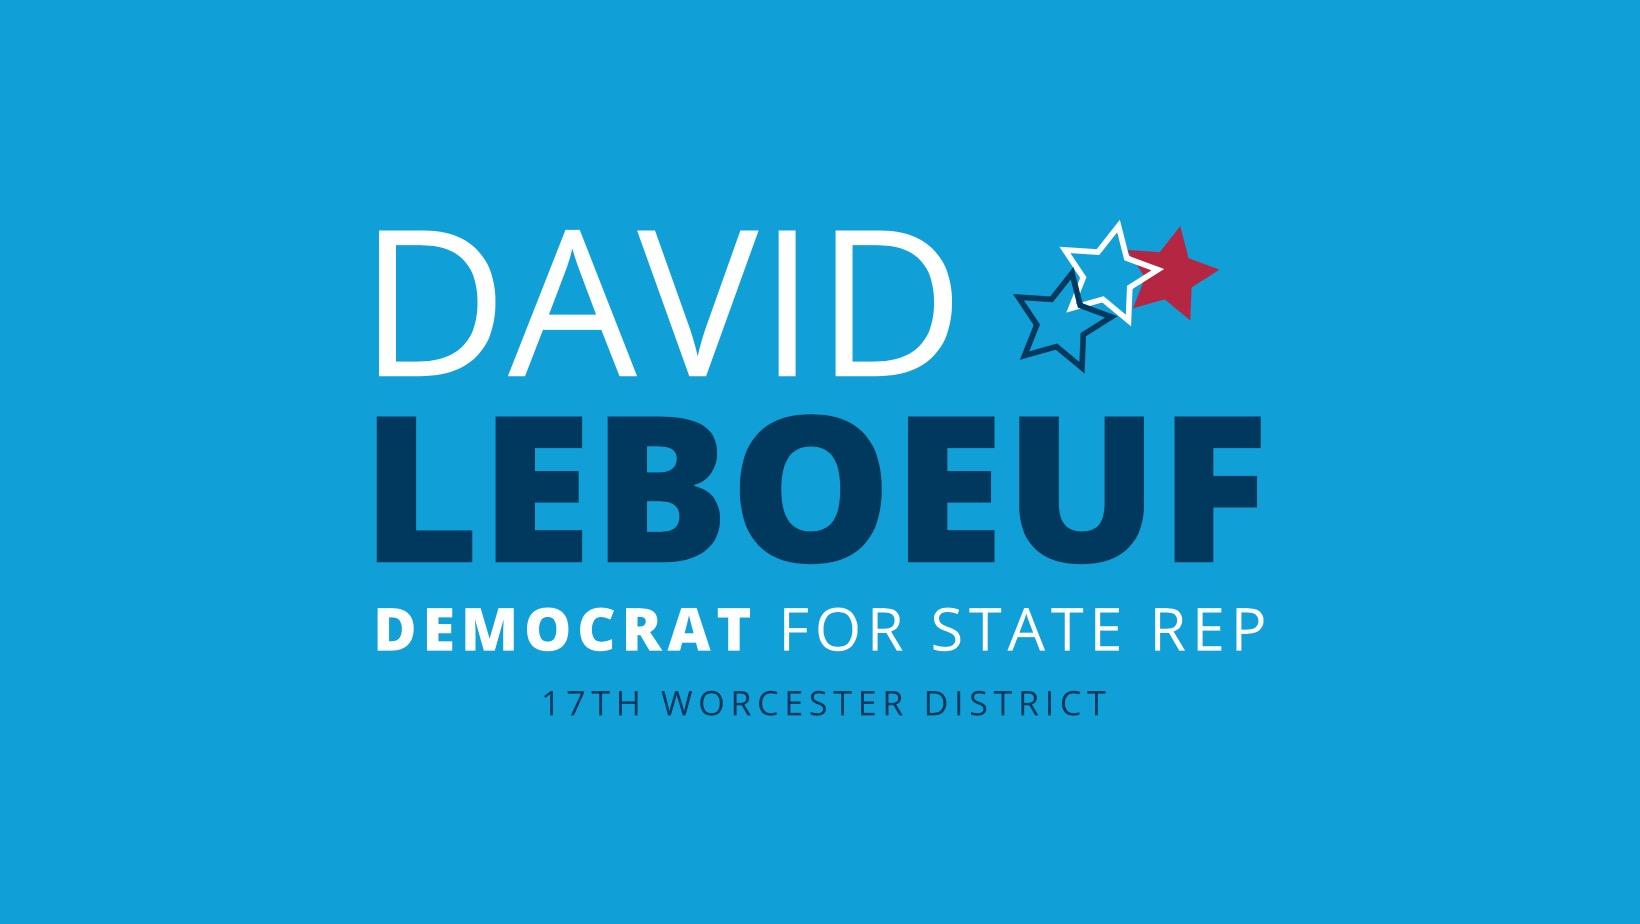 David LeBoeuf